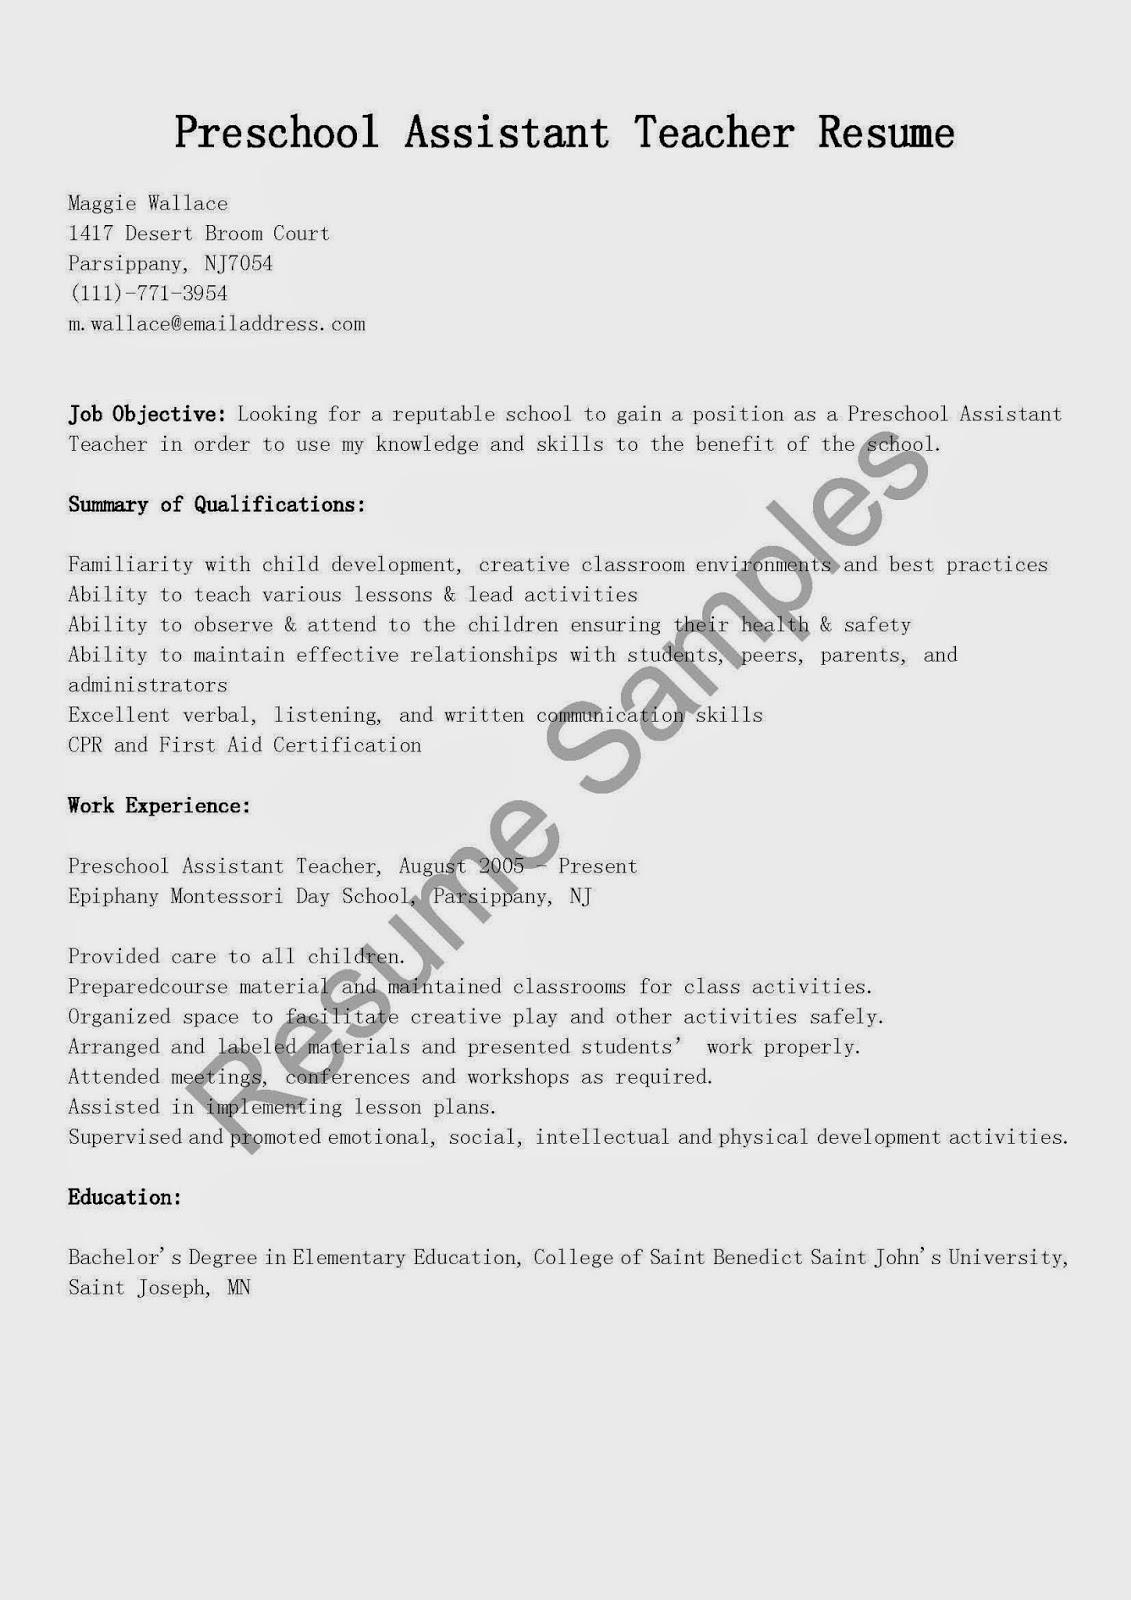 resume for child care resume format pdf resume for child care child care provider resumechild care resume child care resume skills professional child